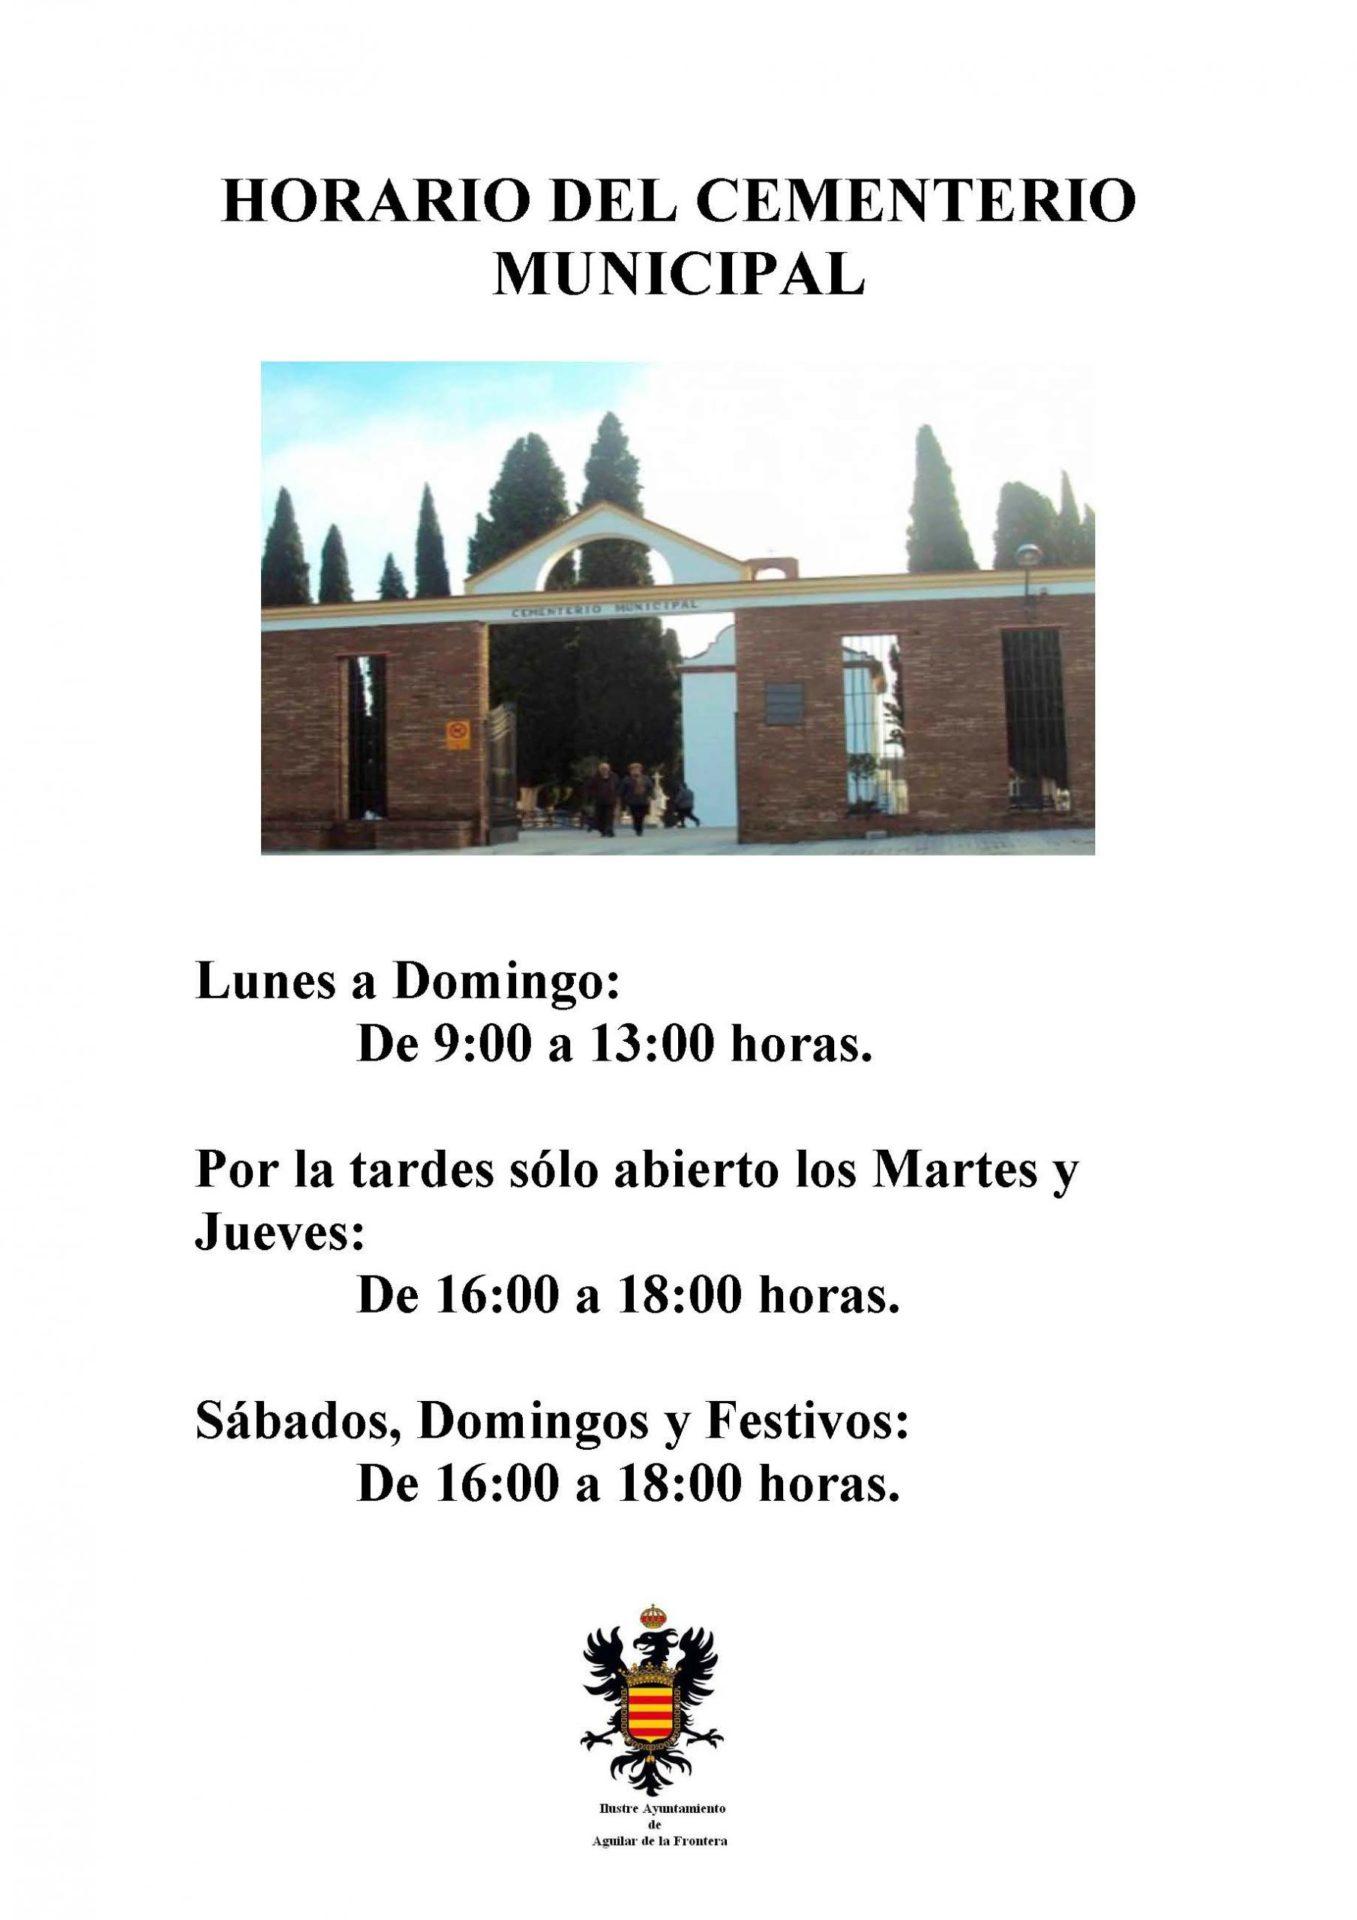 HORARIO DEL CEMENTERIO MUNICIPAL 1